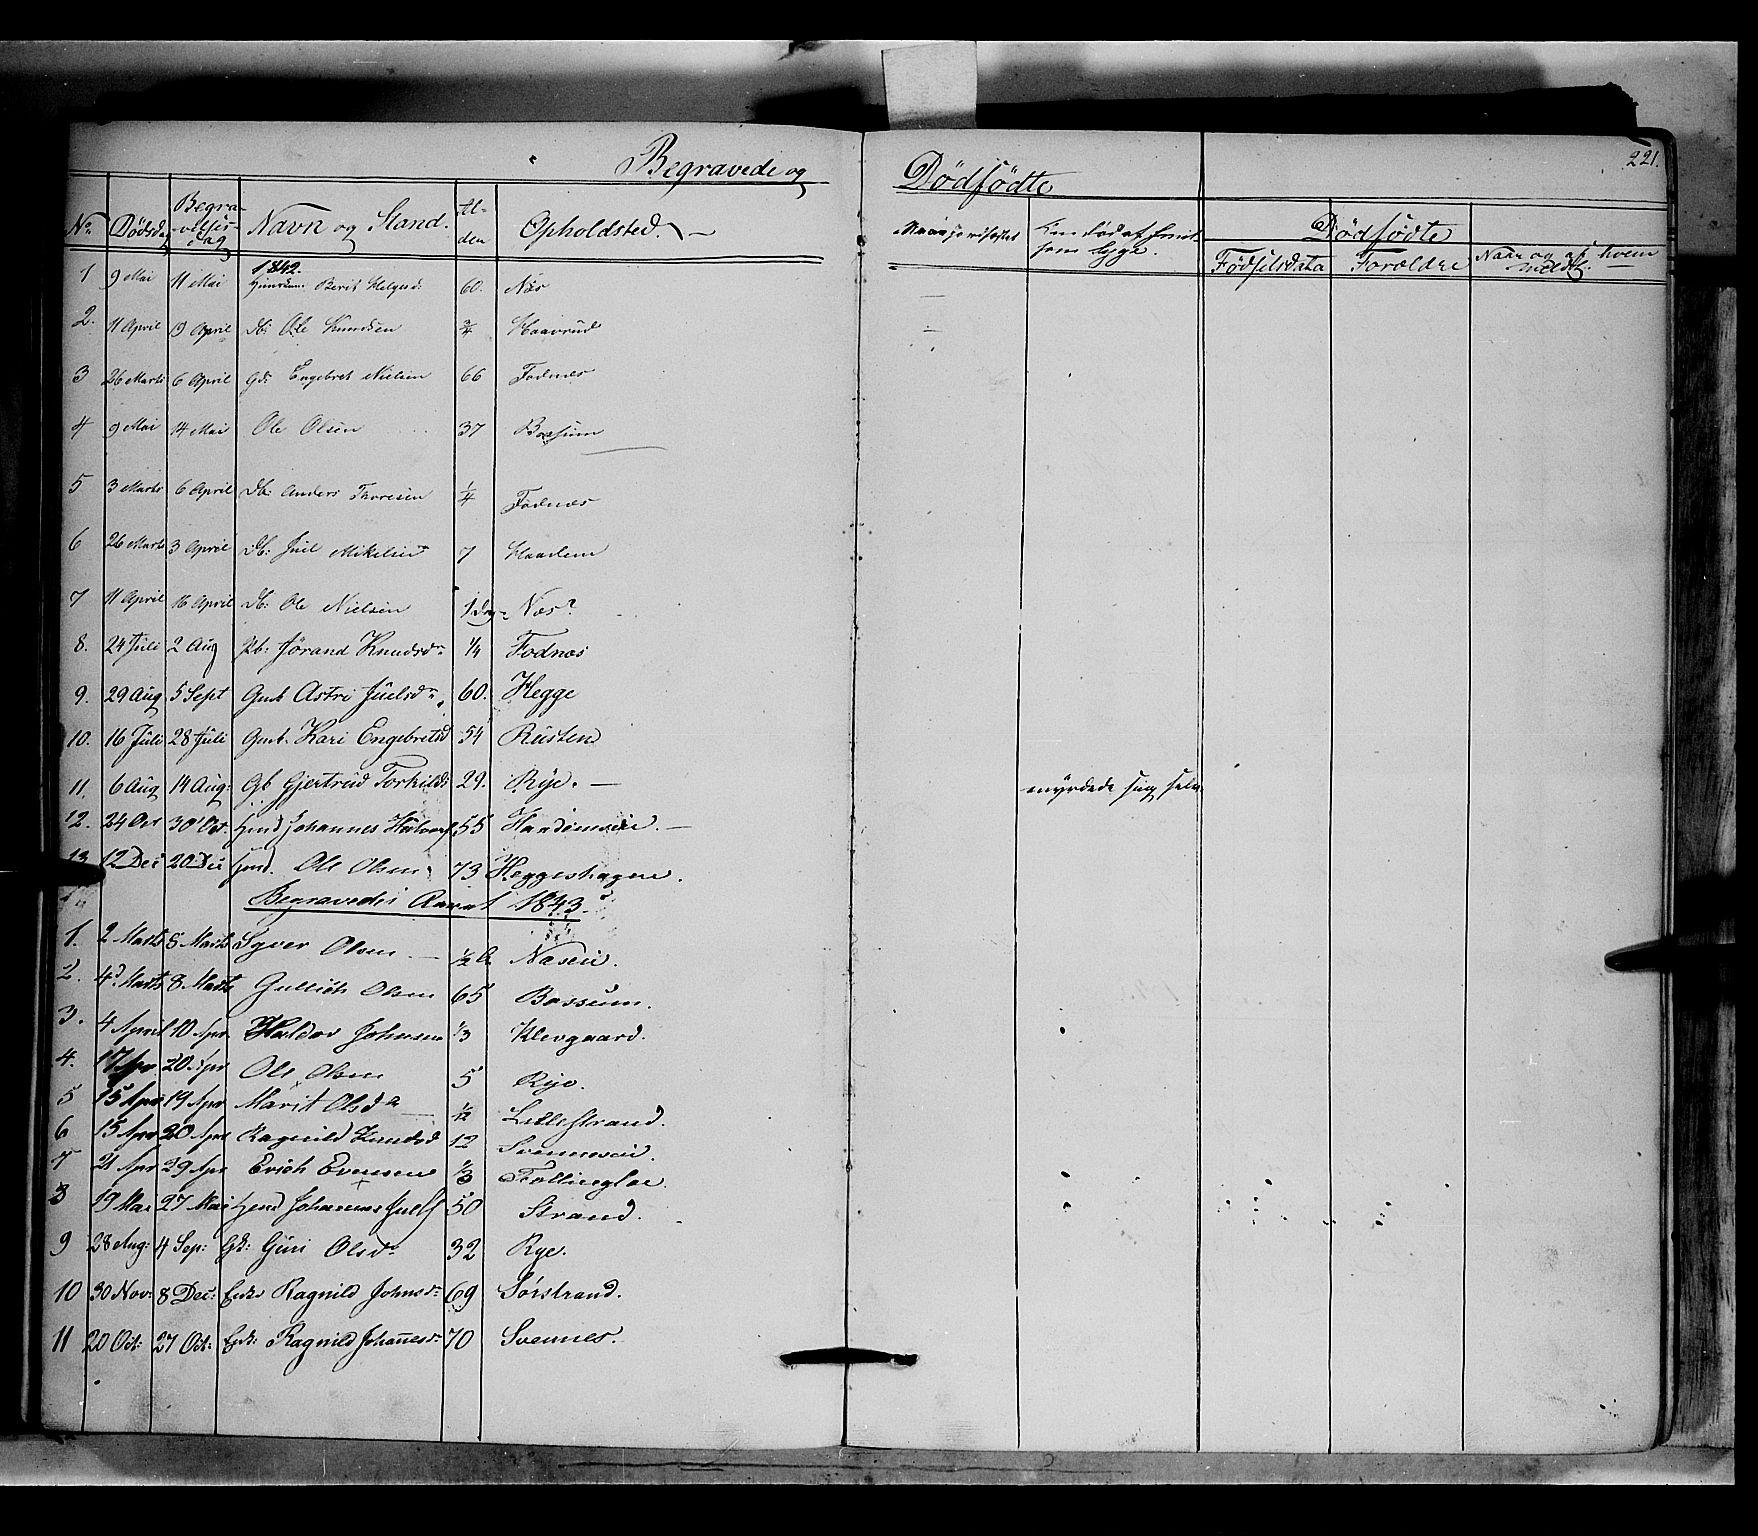 SAH, Nord-Aurdal prestekontor, Ministerialbok nr. 5, 1842-1863, s. 221